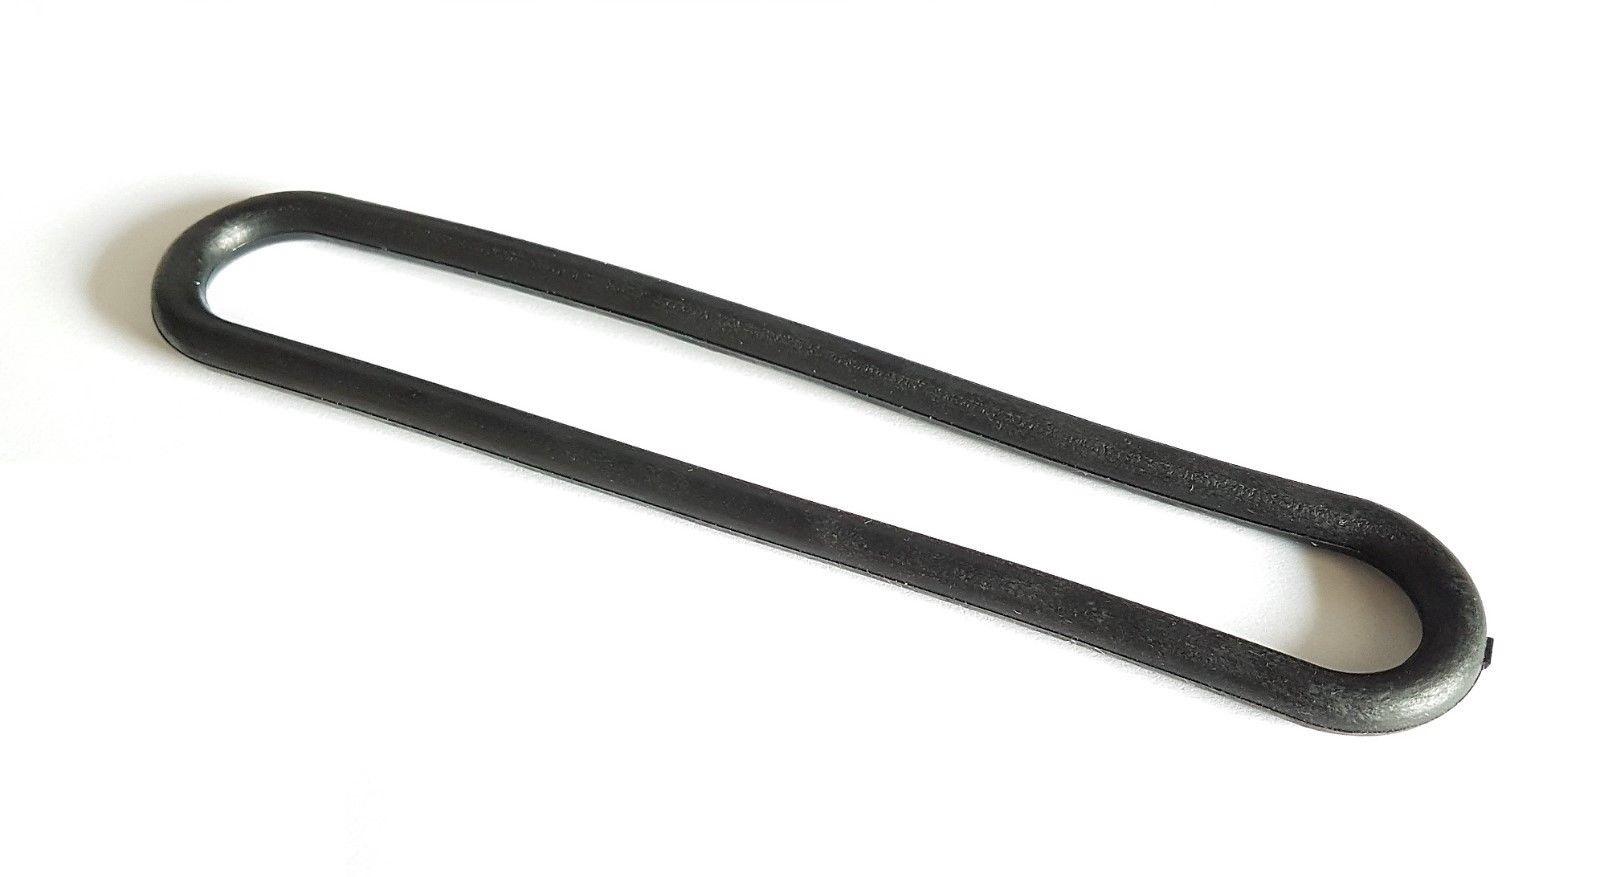 Spanrubbers zwart 20 cm 8 mm dik